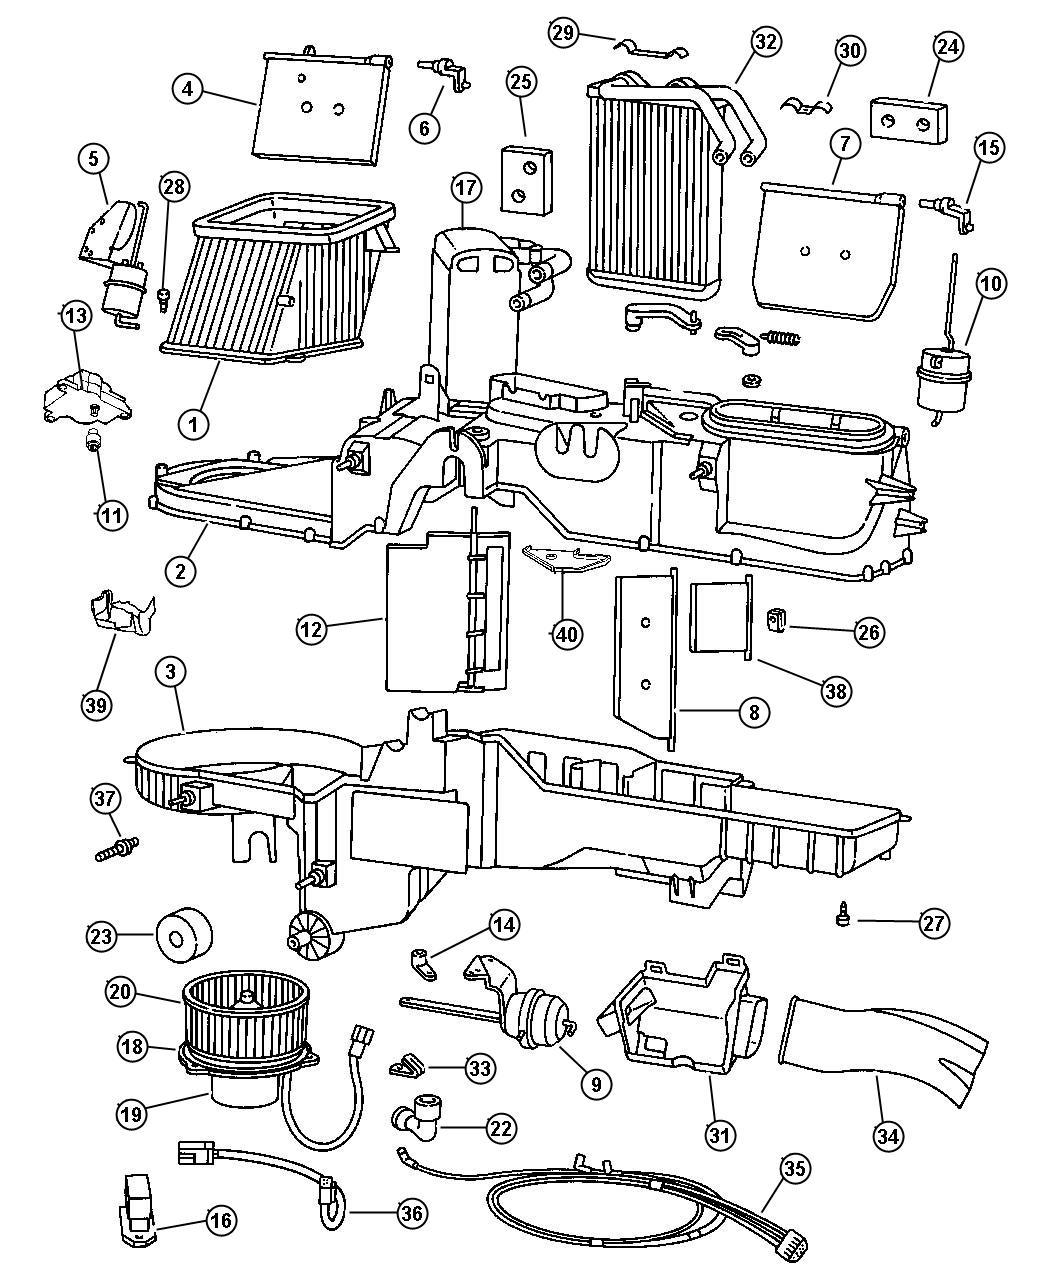 1999 dodge ram 1500 front axle diagram redarc bcdc1240 wiring 1997 3500 parts free engine image